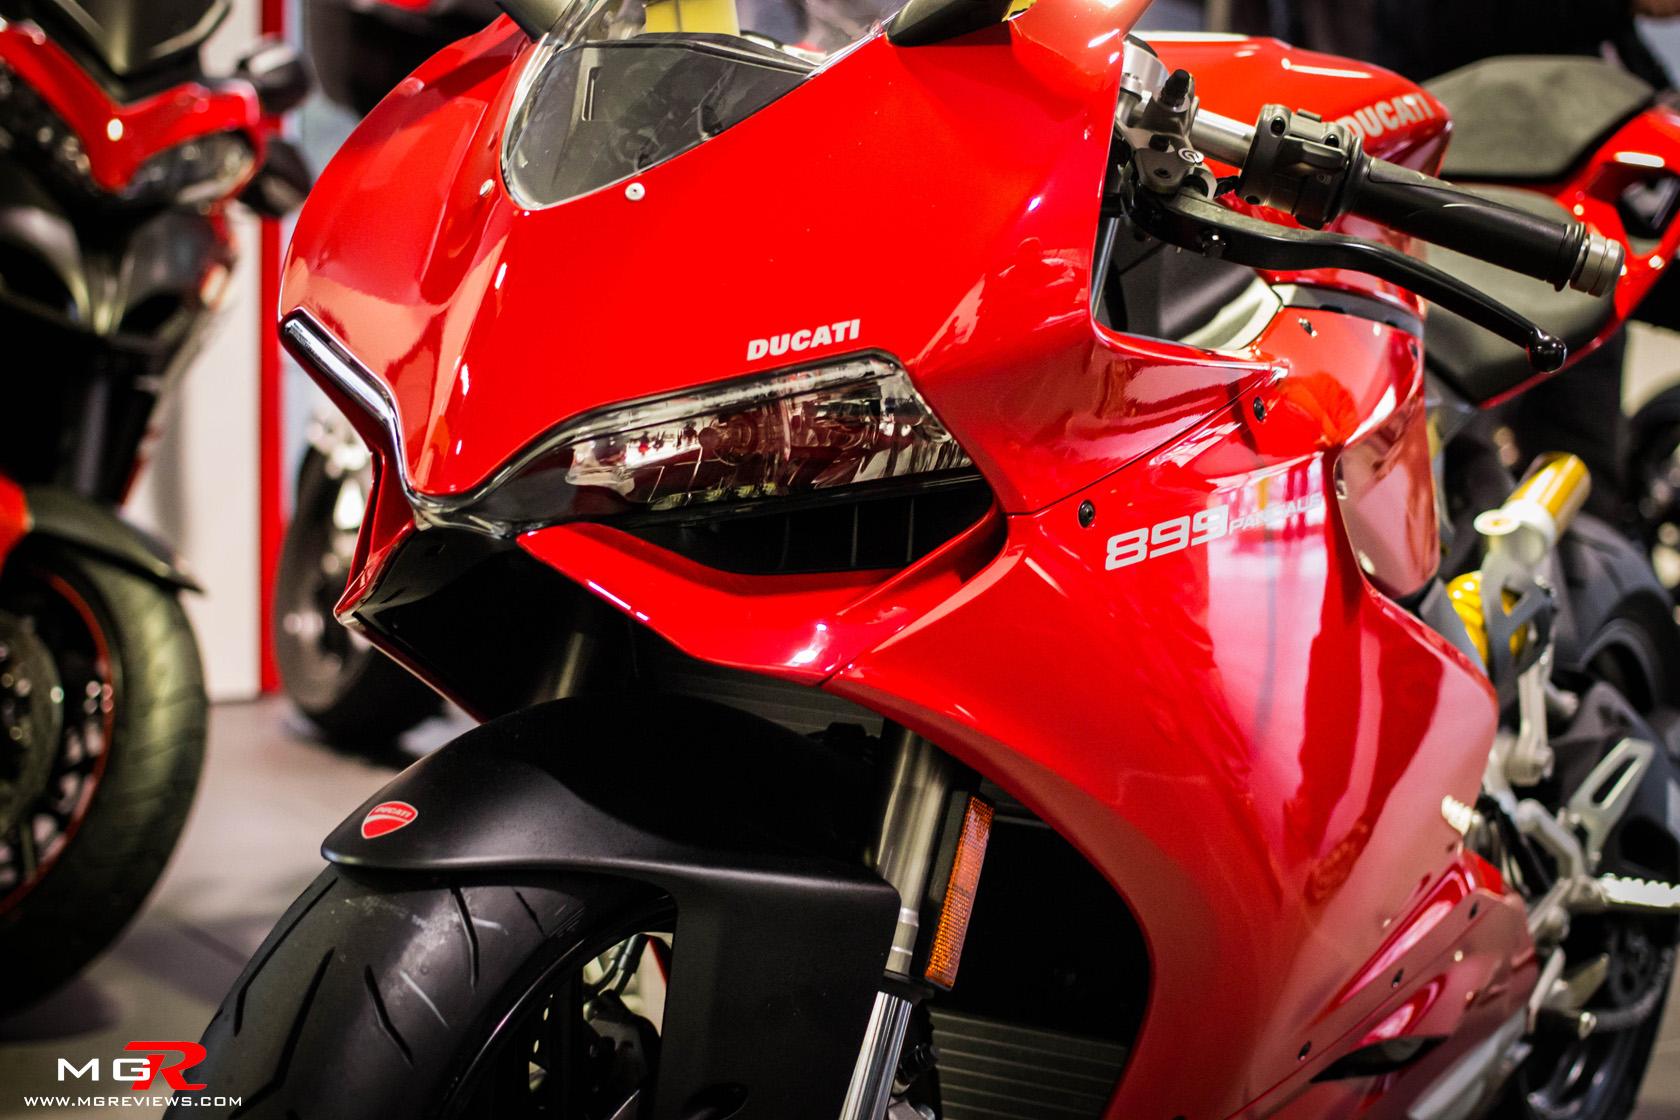 2014 Ducati ... Ducati 748s Review